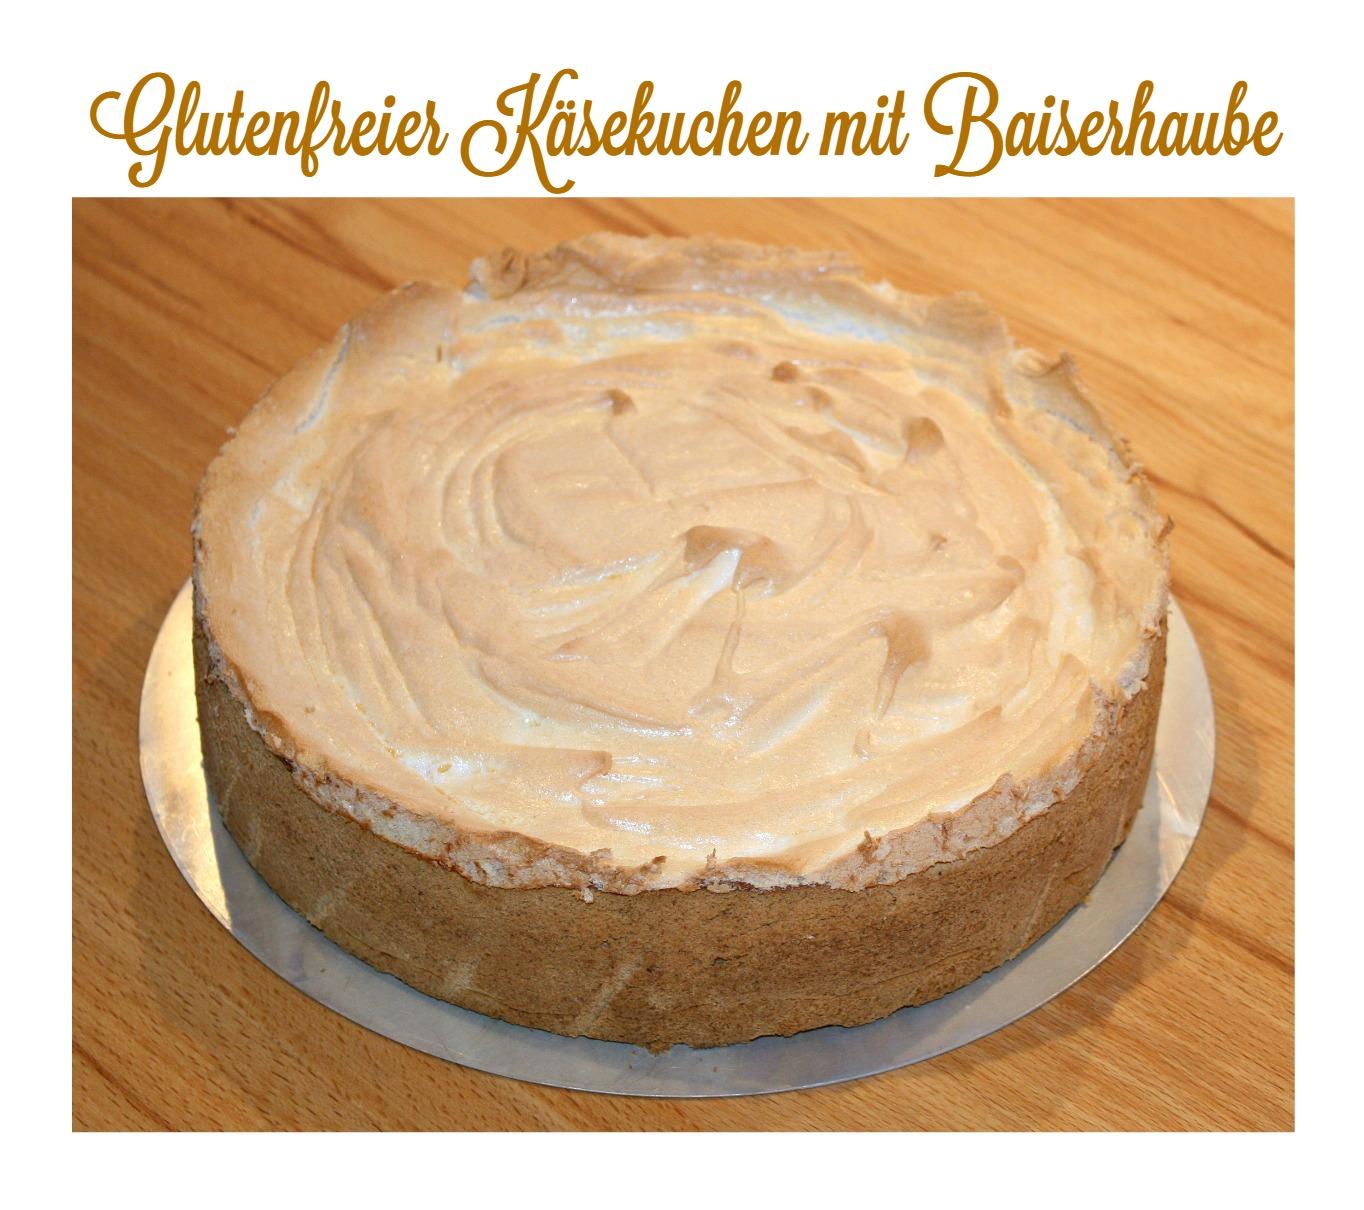 Rezept glutenfreier Käsekuchen mit Baiserhaube